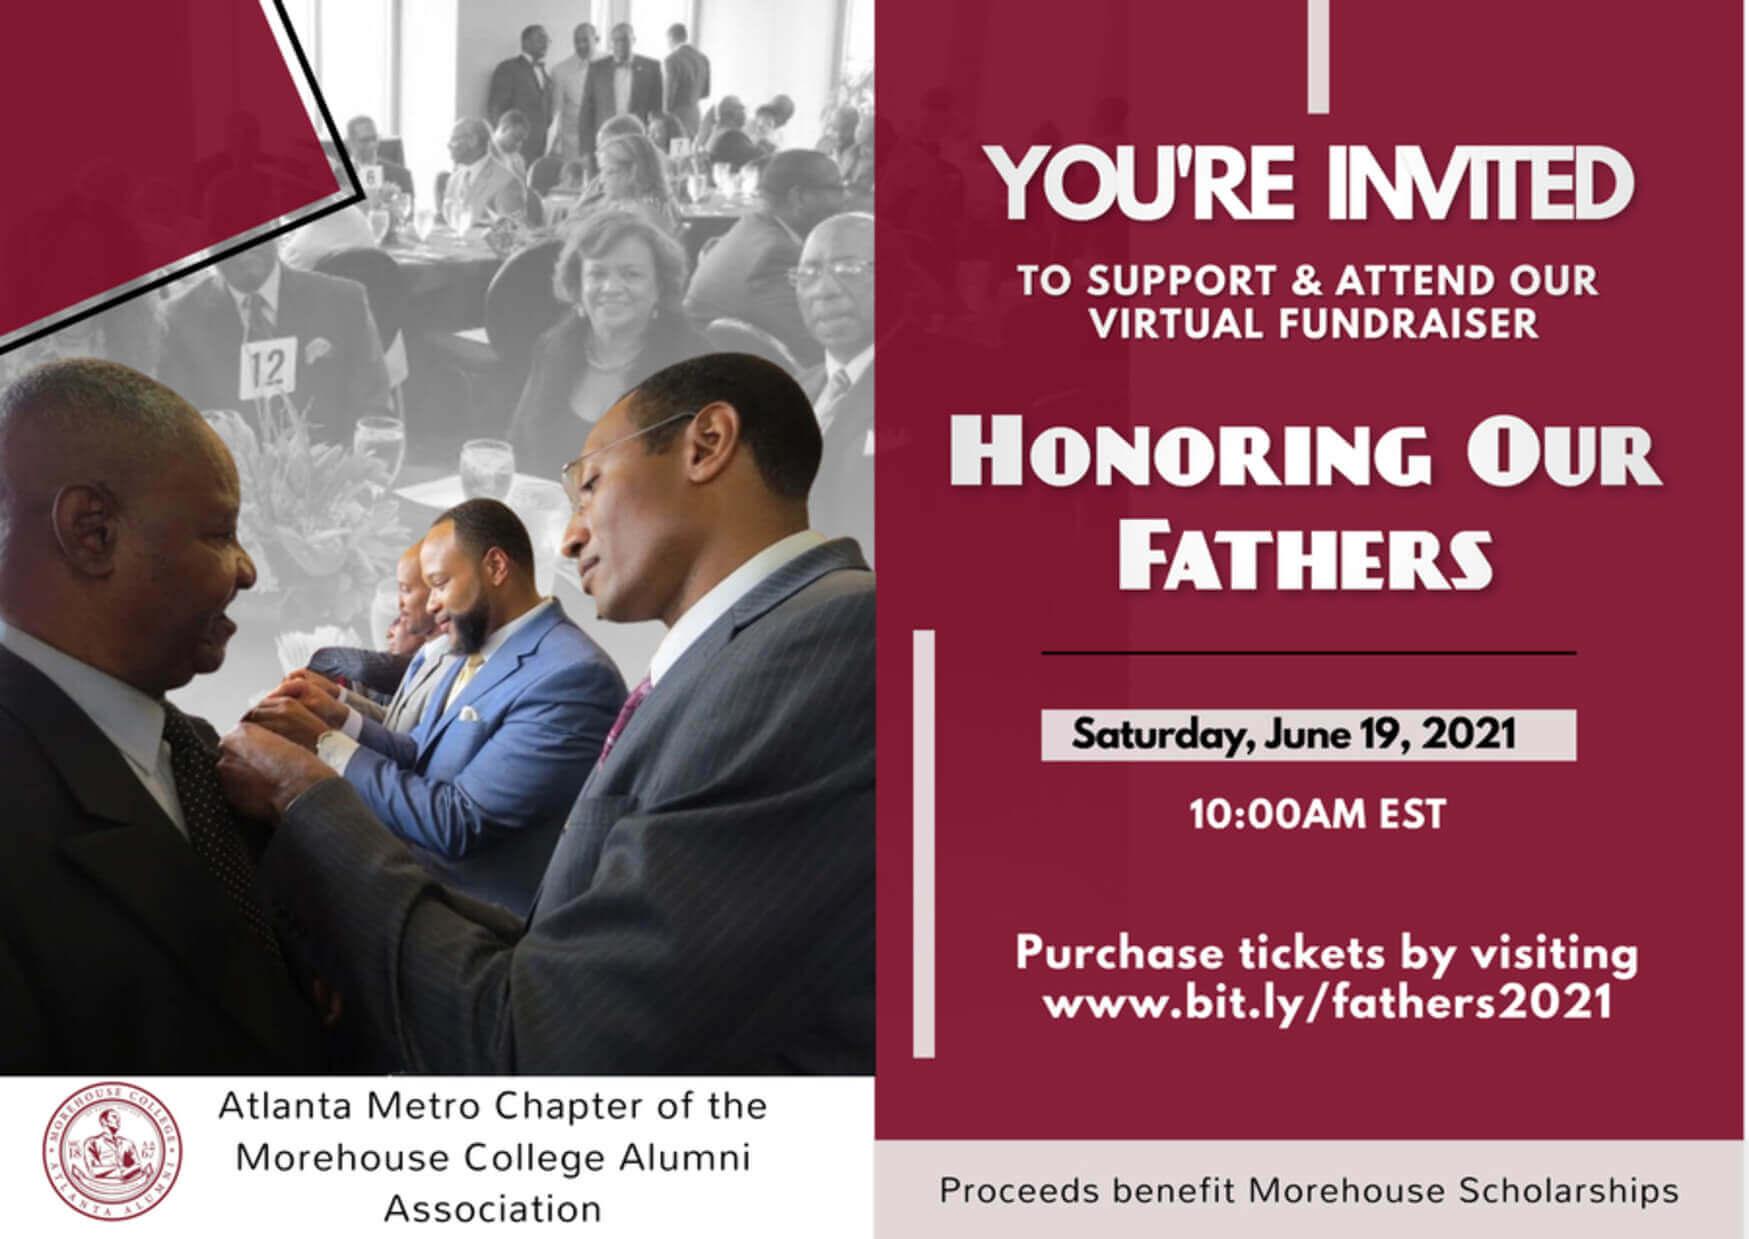 2021 Honoring Our Fathers Awards & Fundraiser Morehouse Atlanta Alumni